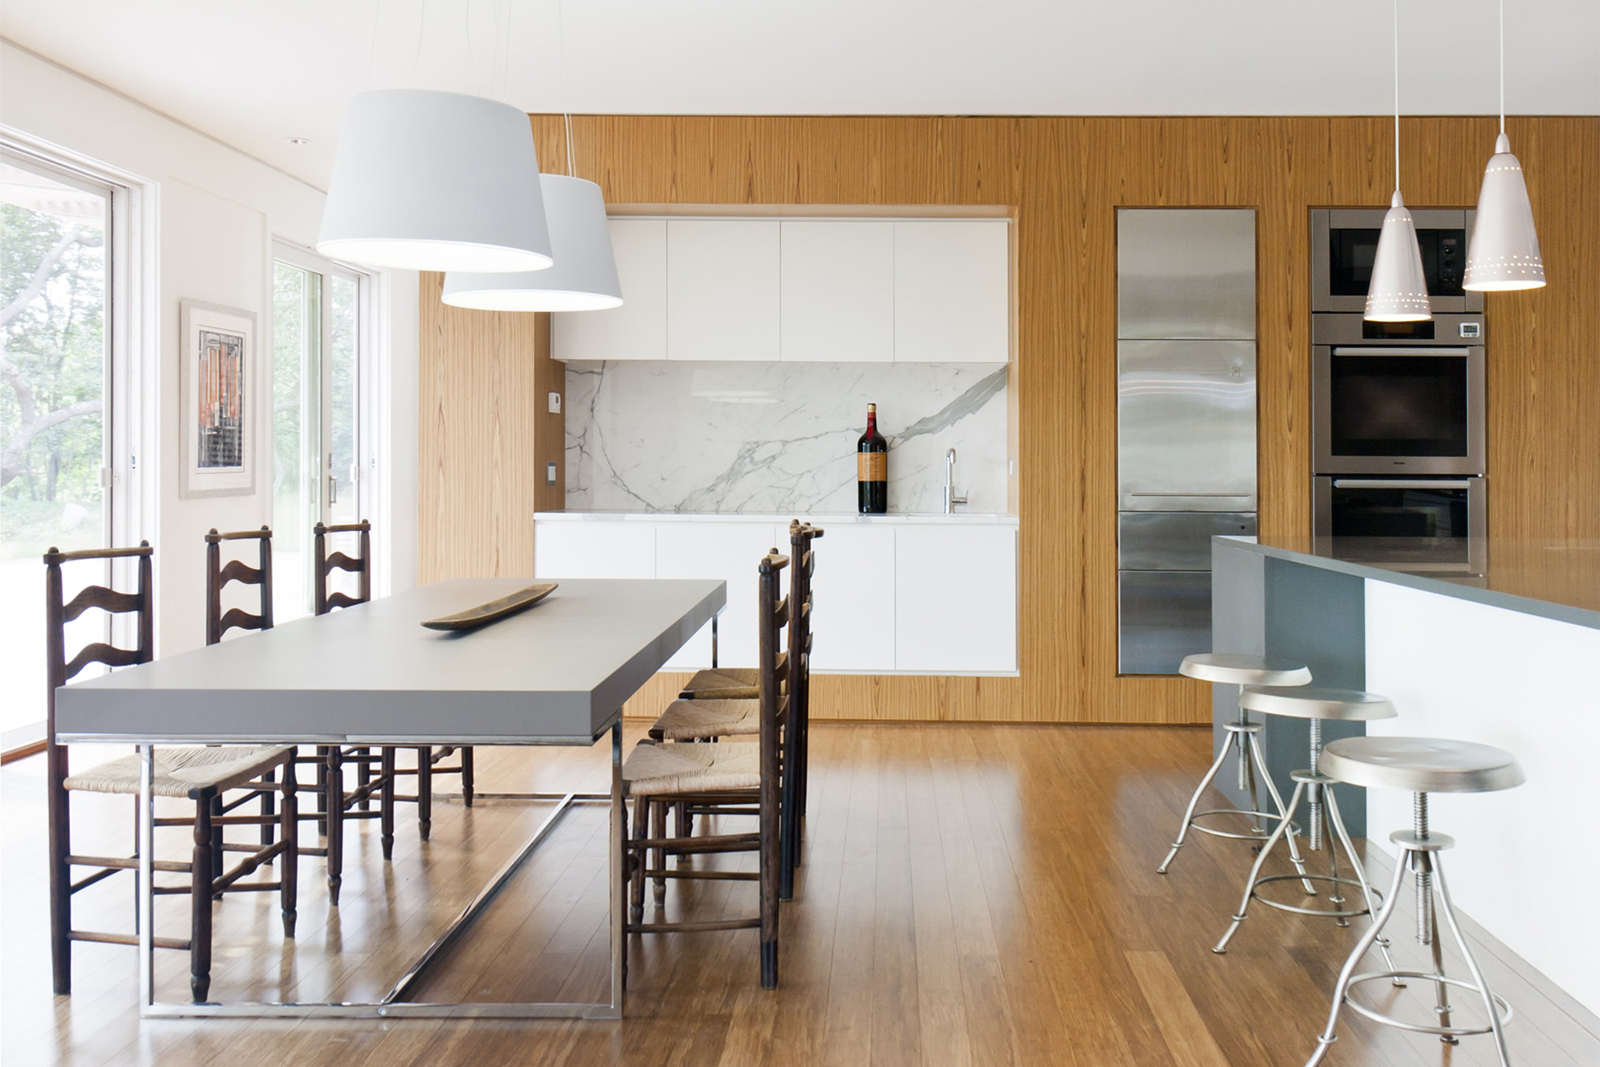 11-res4-resolution-4-architecture-modern-modular-home-prefab-house-fishers-island-interior-kitchen-dining.jpg